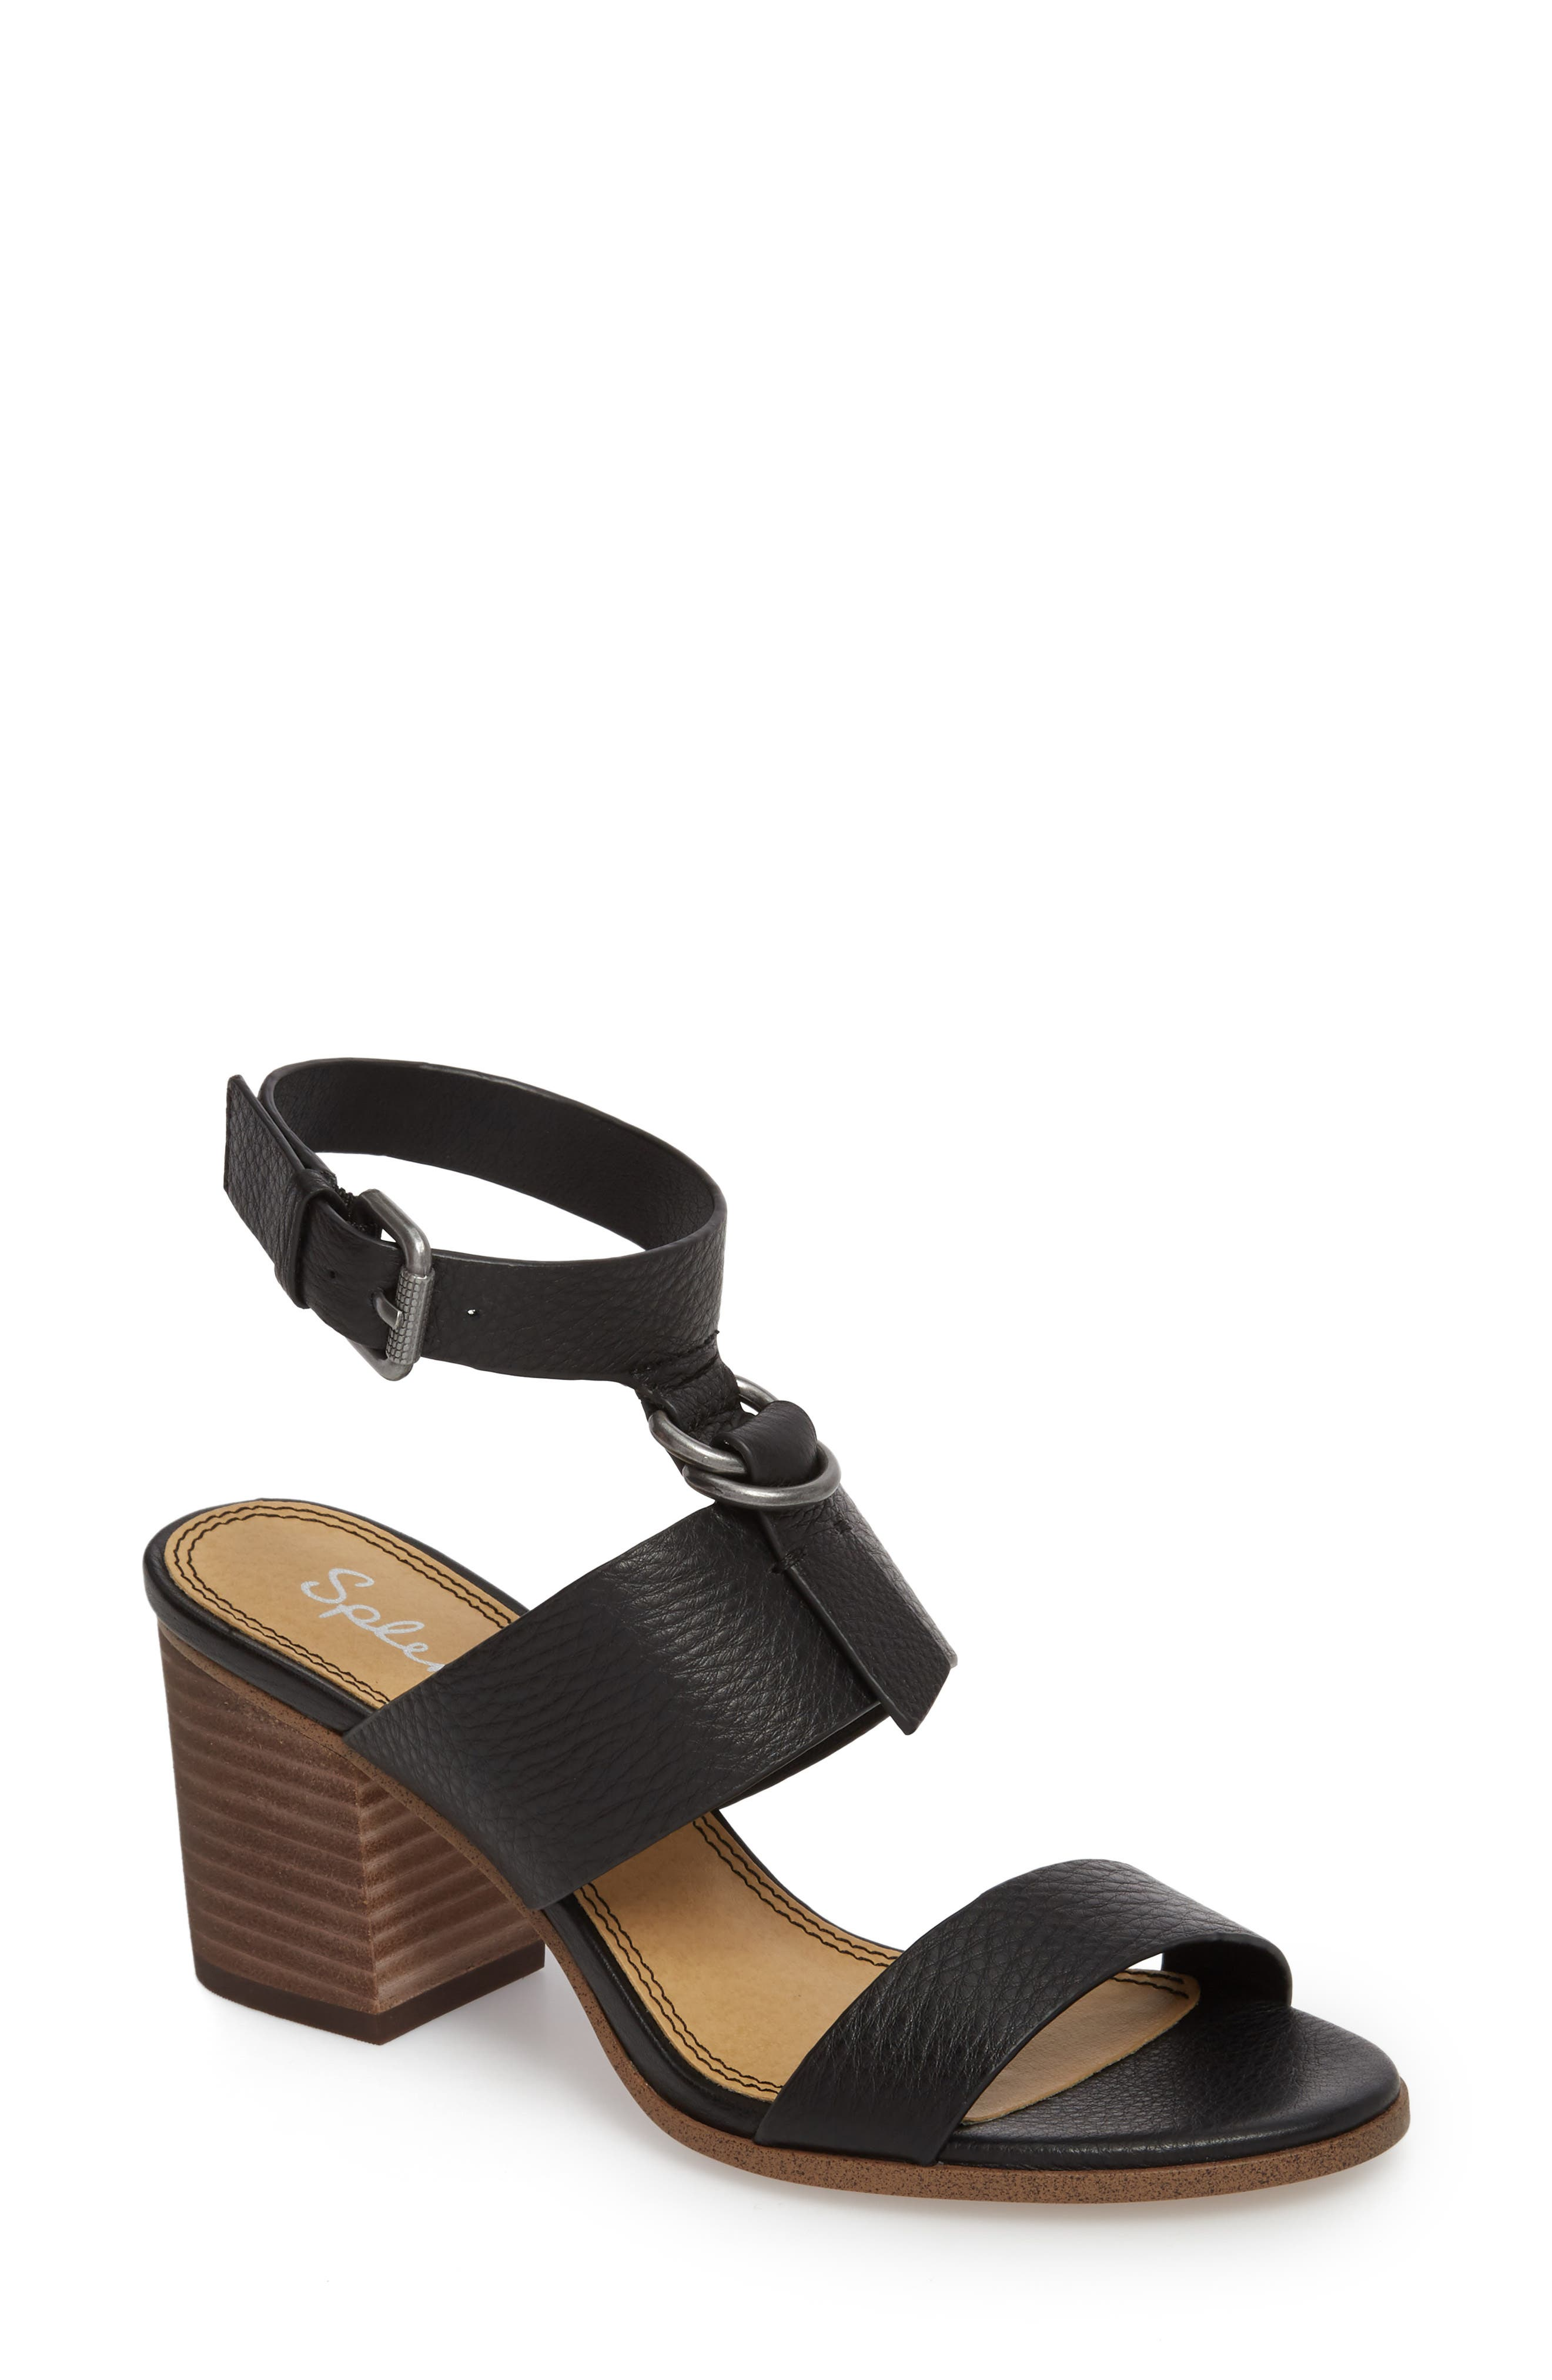 Faron Block Heel Sandal,                         Main,                         color,